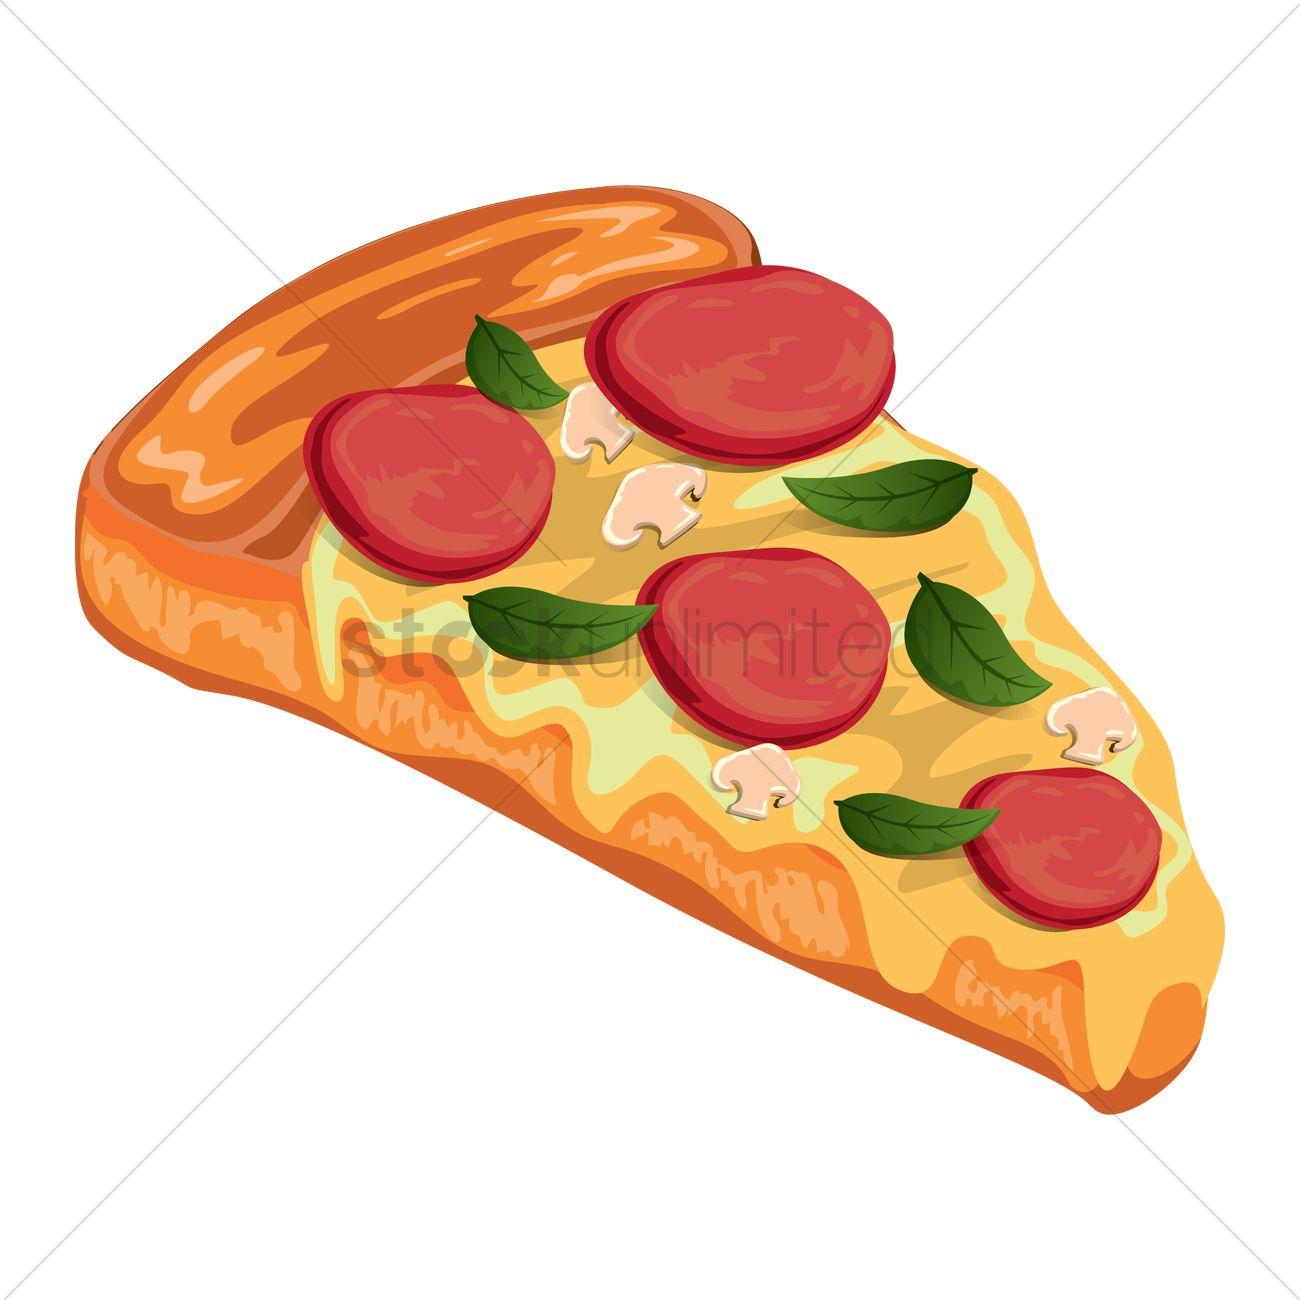 pizza slice vector image 1555860 stockunlimited rh stockunlimited com pizza slice vector image free pizza slice vector free